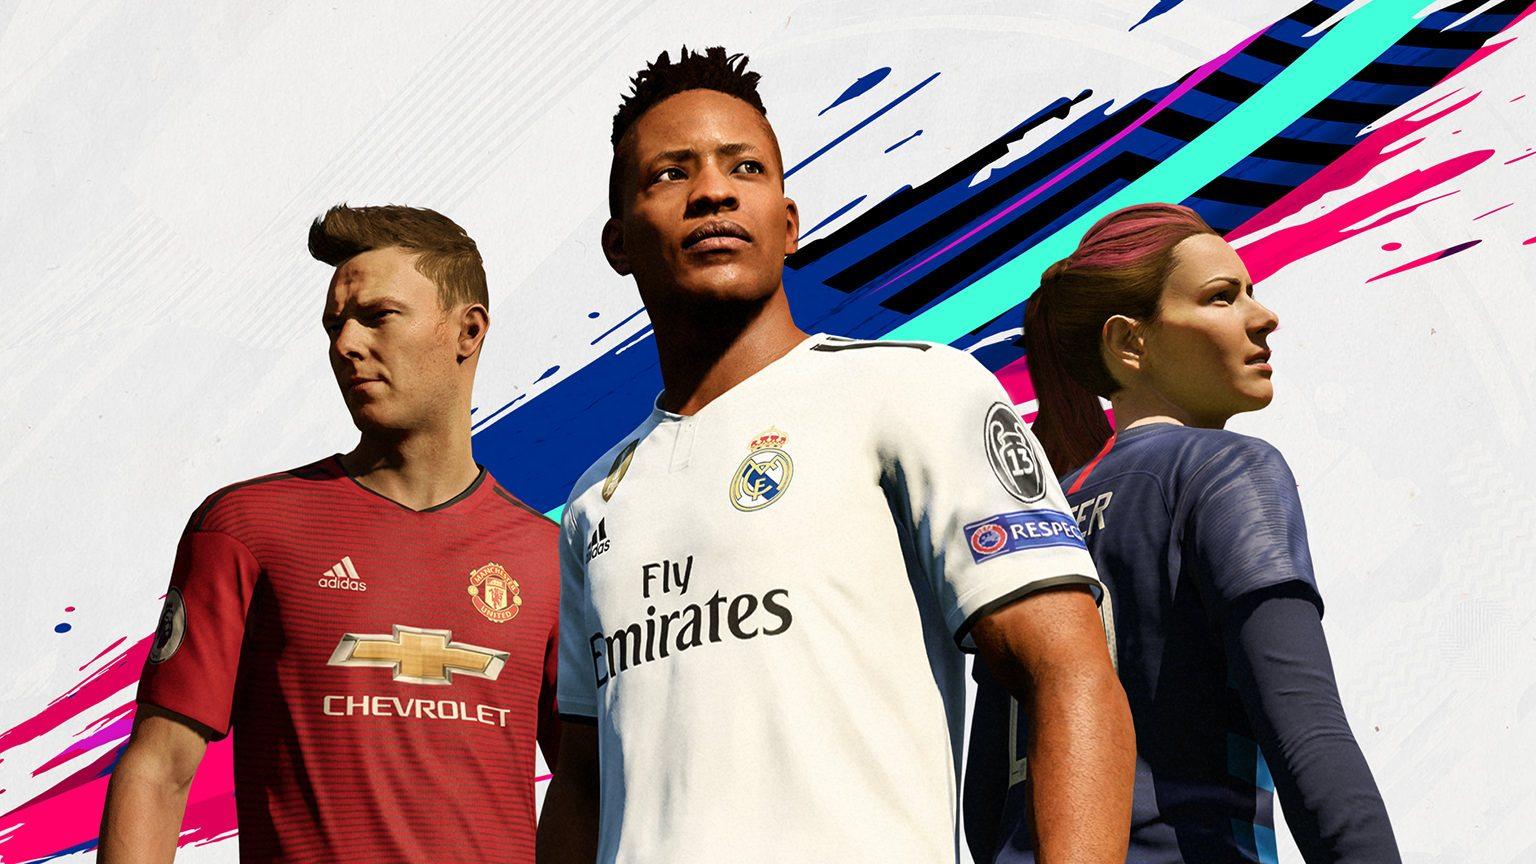 FIFA 19 The Journey Three Heros: Alex Hunter, Kim Hunter and Danny Williams